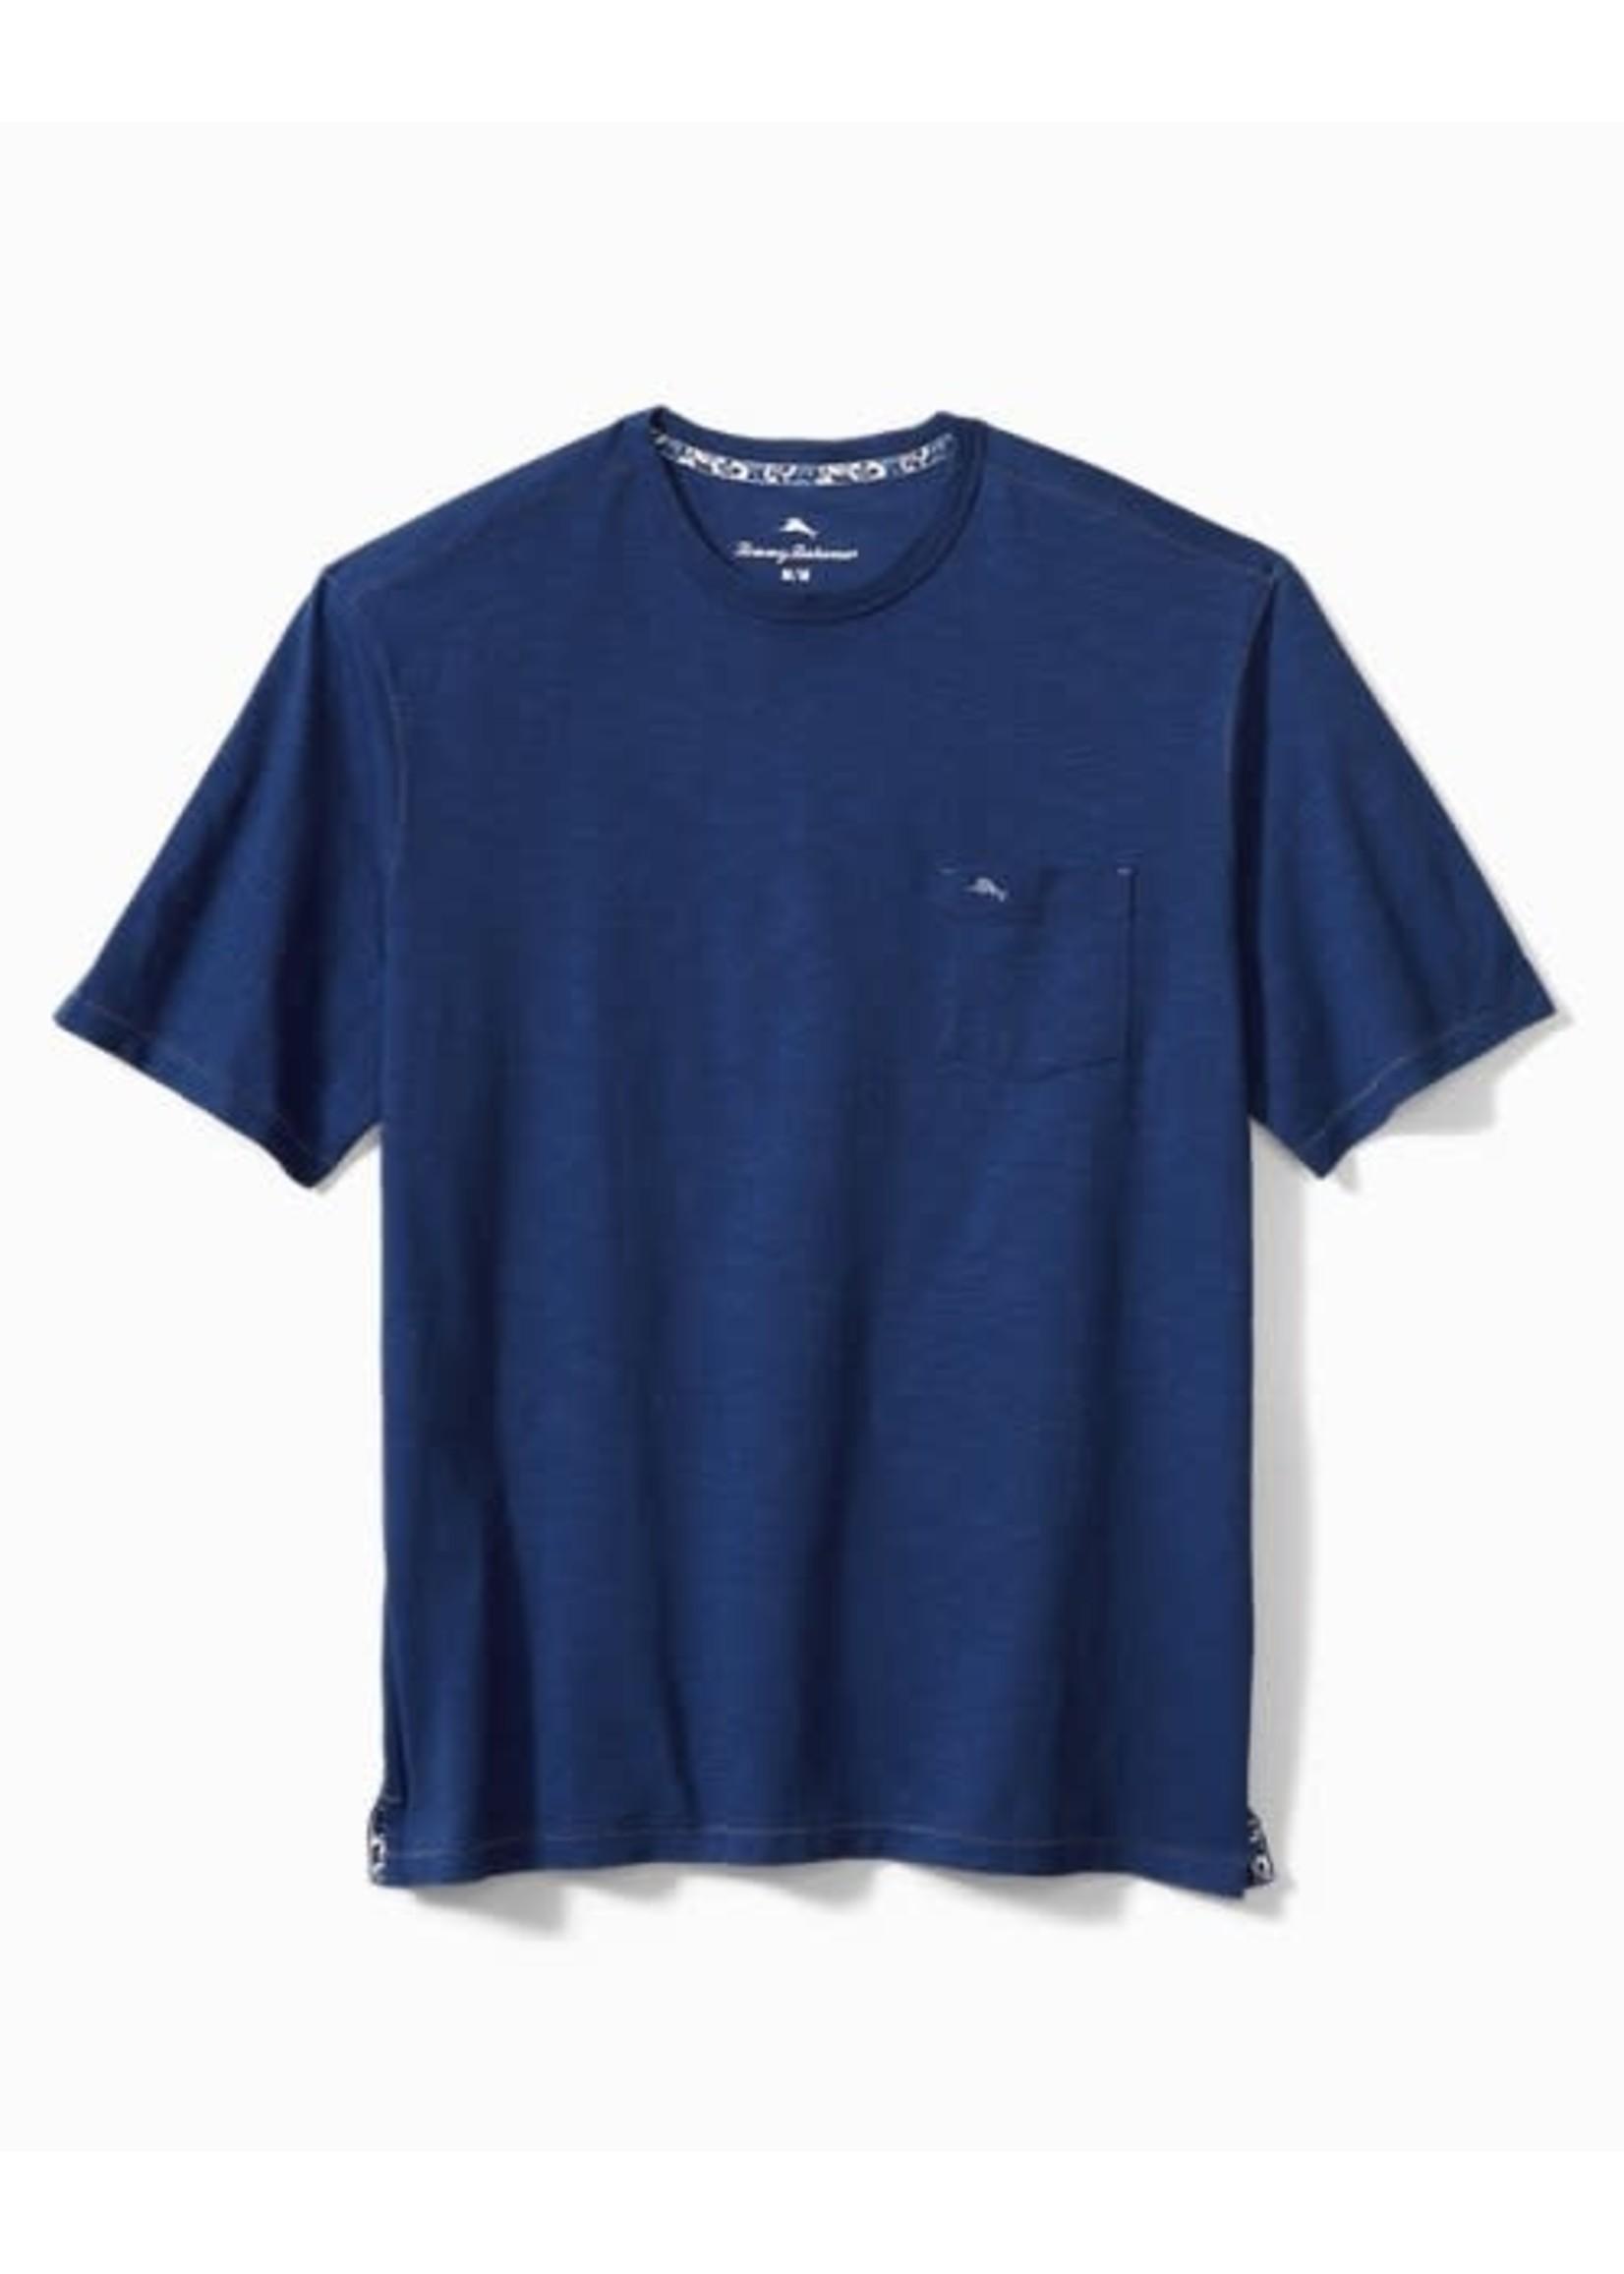 Tommy Bahama Bali Beach Crew T-Shirt *Colors*